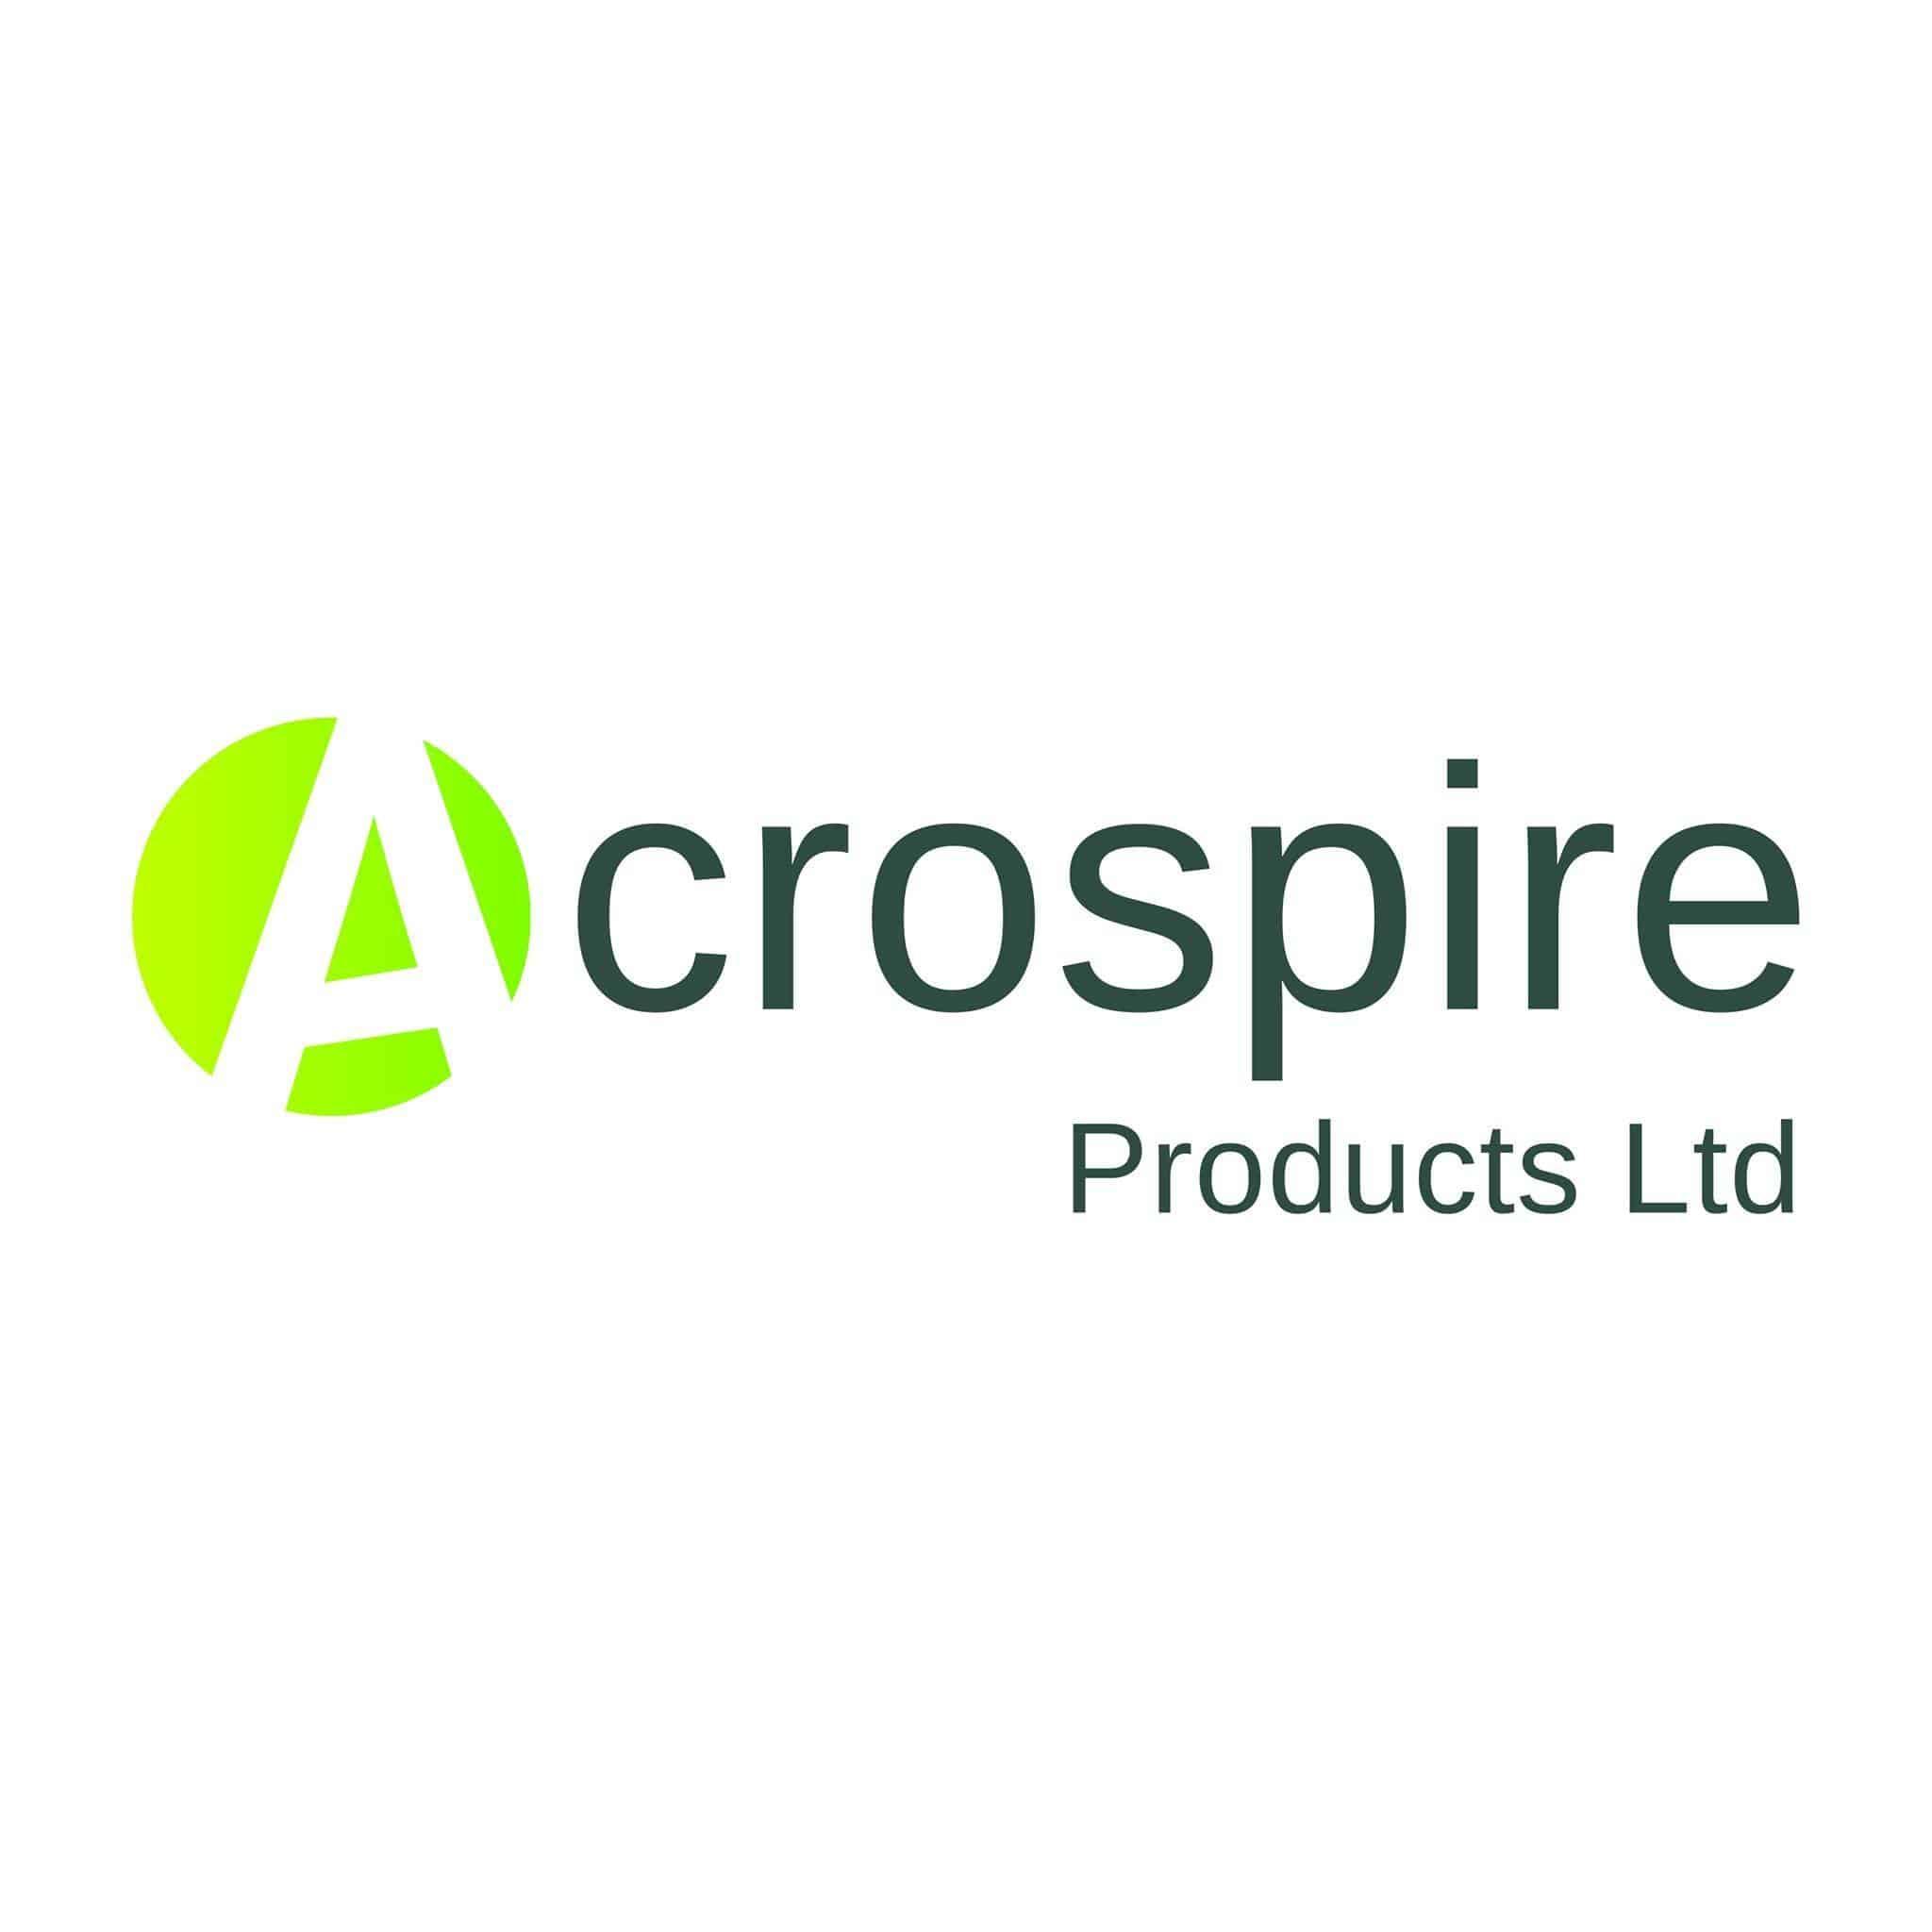 Acrospire Products Ltd